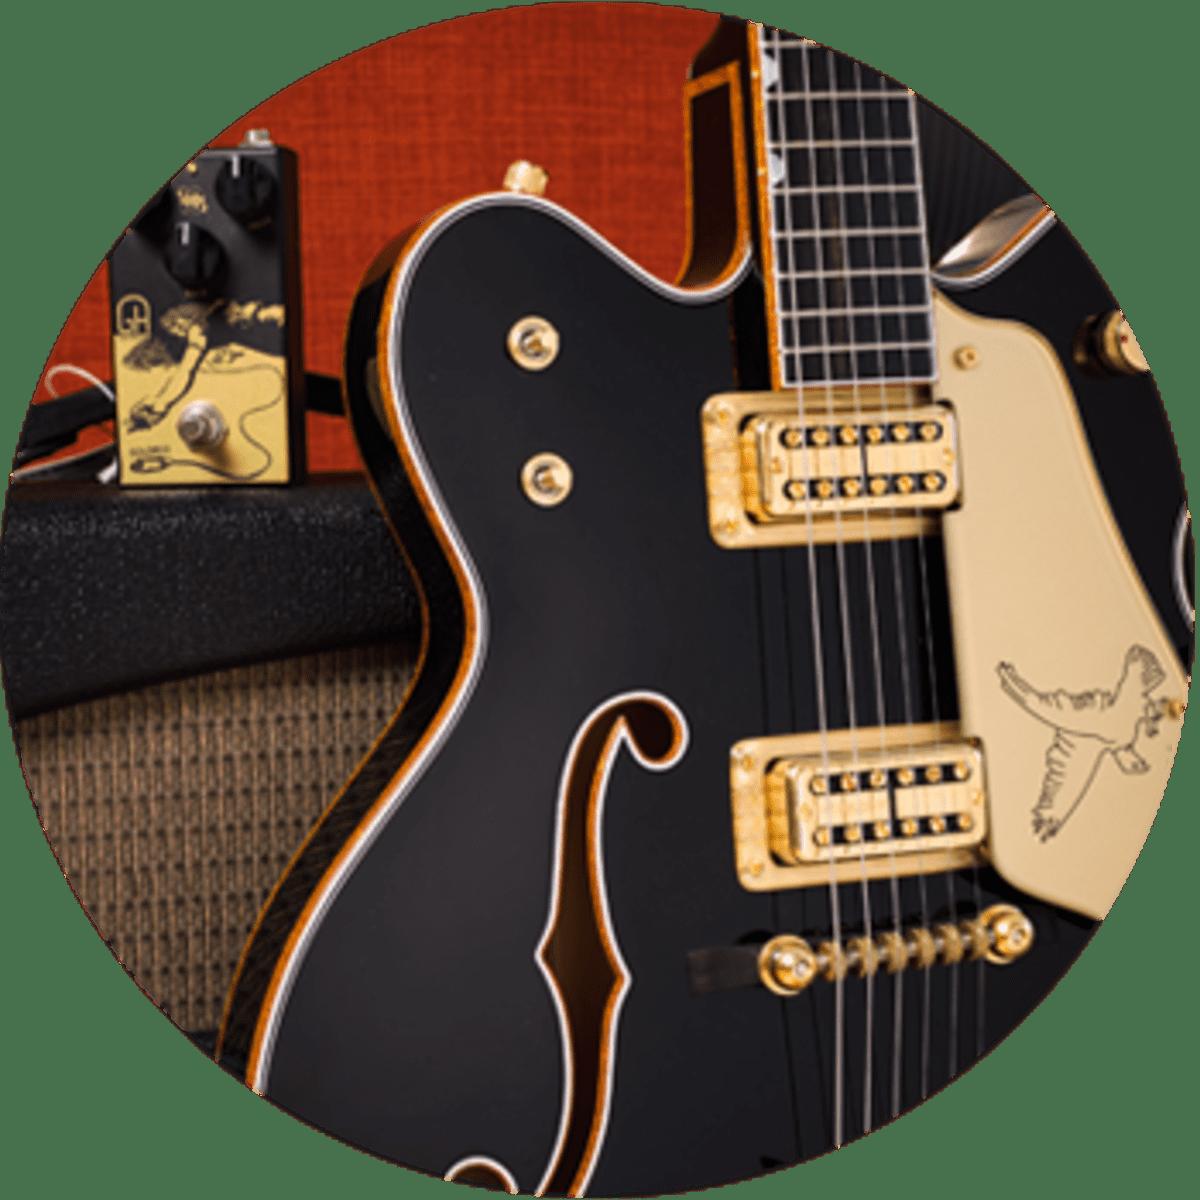 ea8a7650b5 Gretsch Guitars